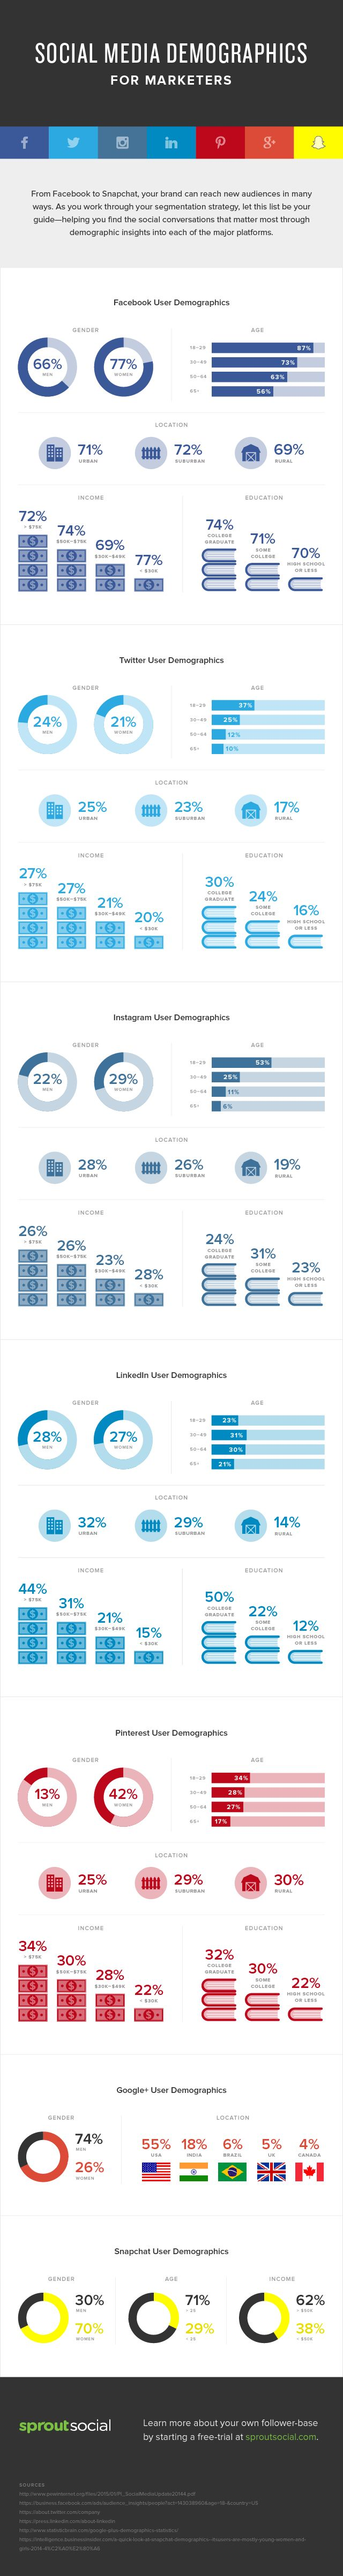 Social Media Demographics for Marketers #infographic #SocialMedia #Marketing